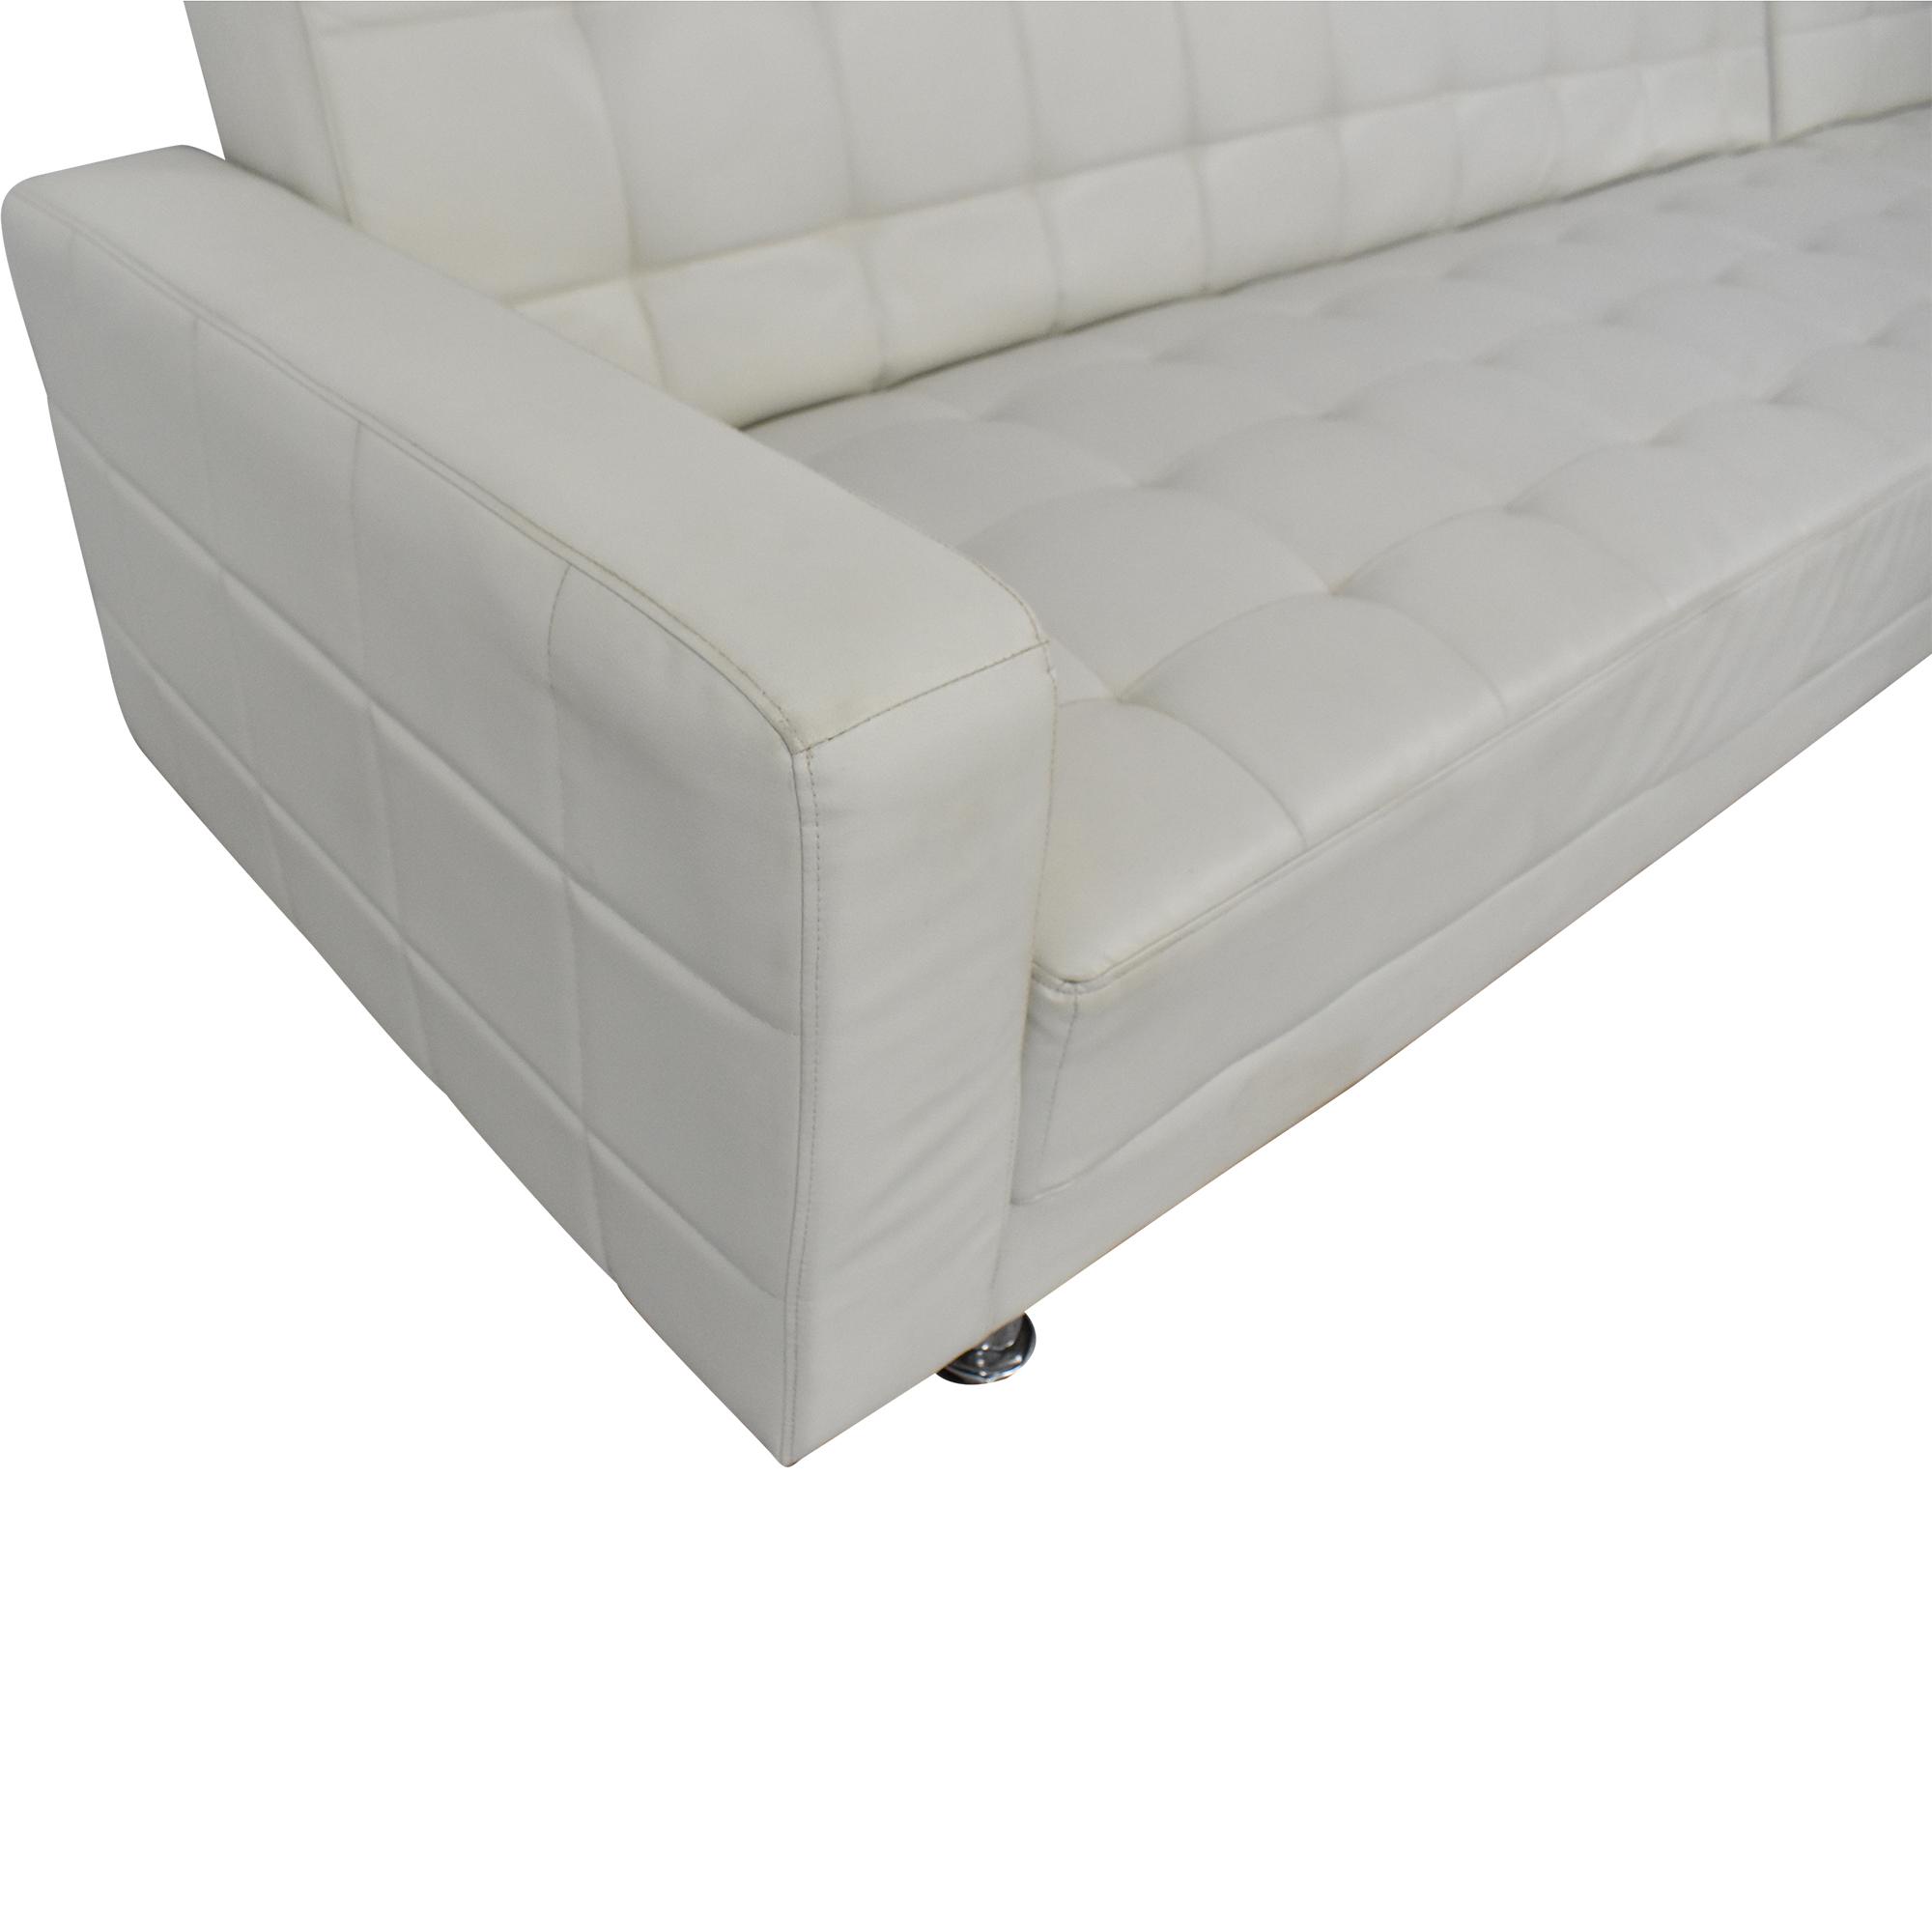 Wayfair Wayfair Spirit Lake Sleeper Sectional Sofa on sale